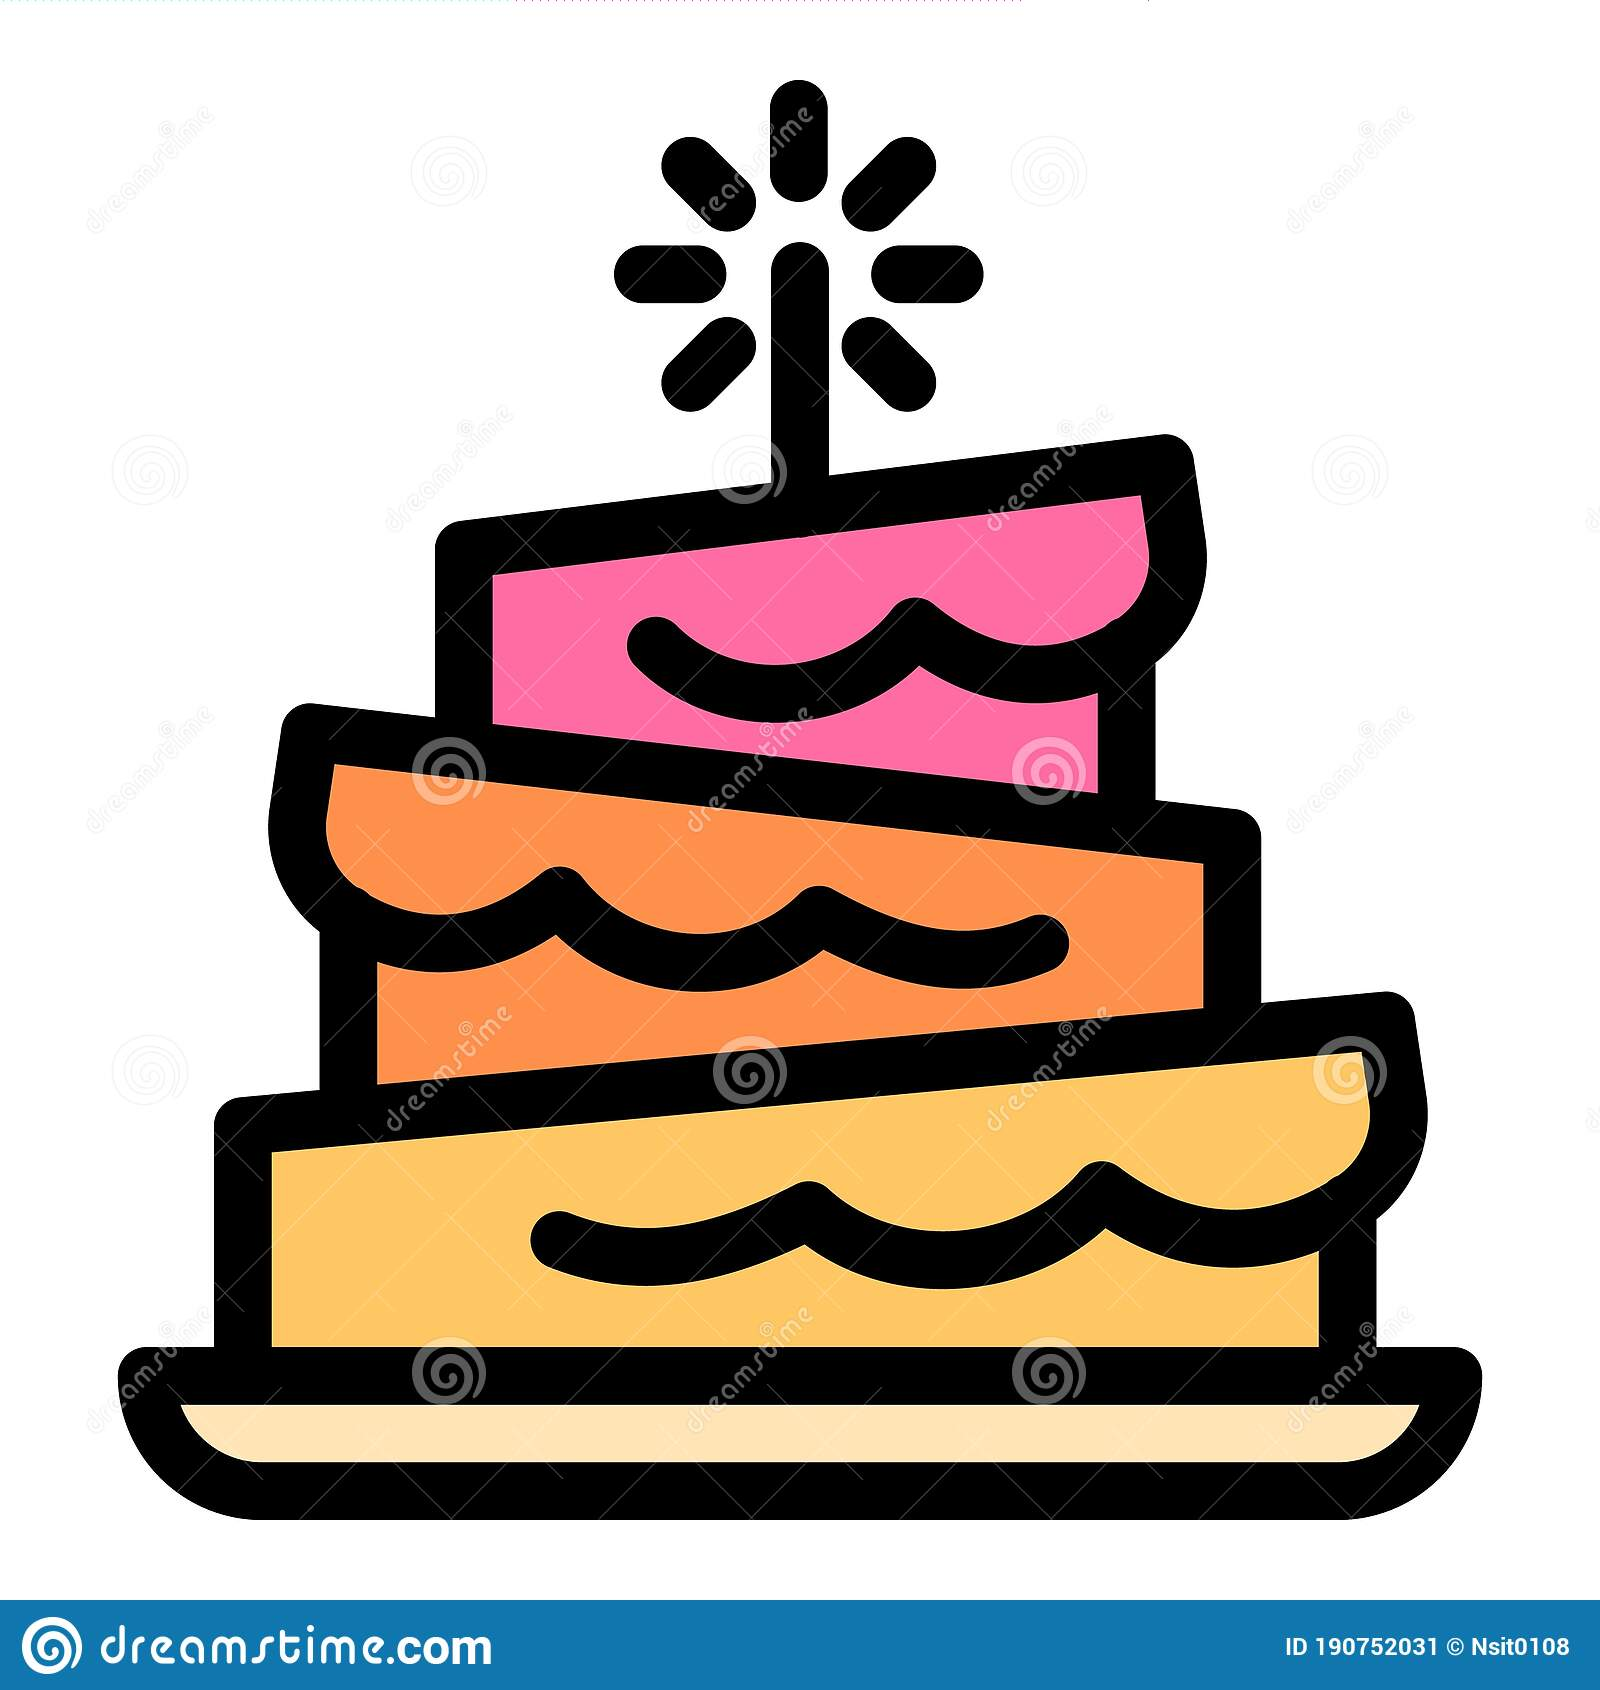 Funny Birthday Cake Stock Illustrations 12 702 Funny Birthday Cake Stock Illustrations Vectors Clipart Dreamstime